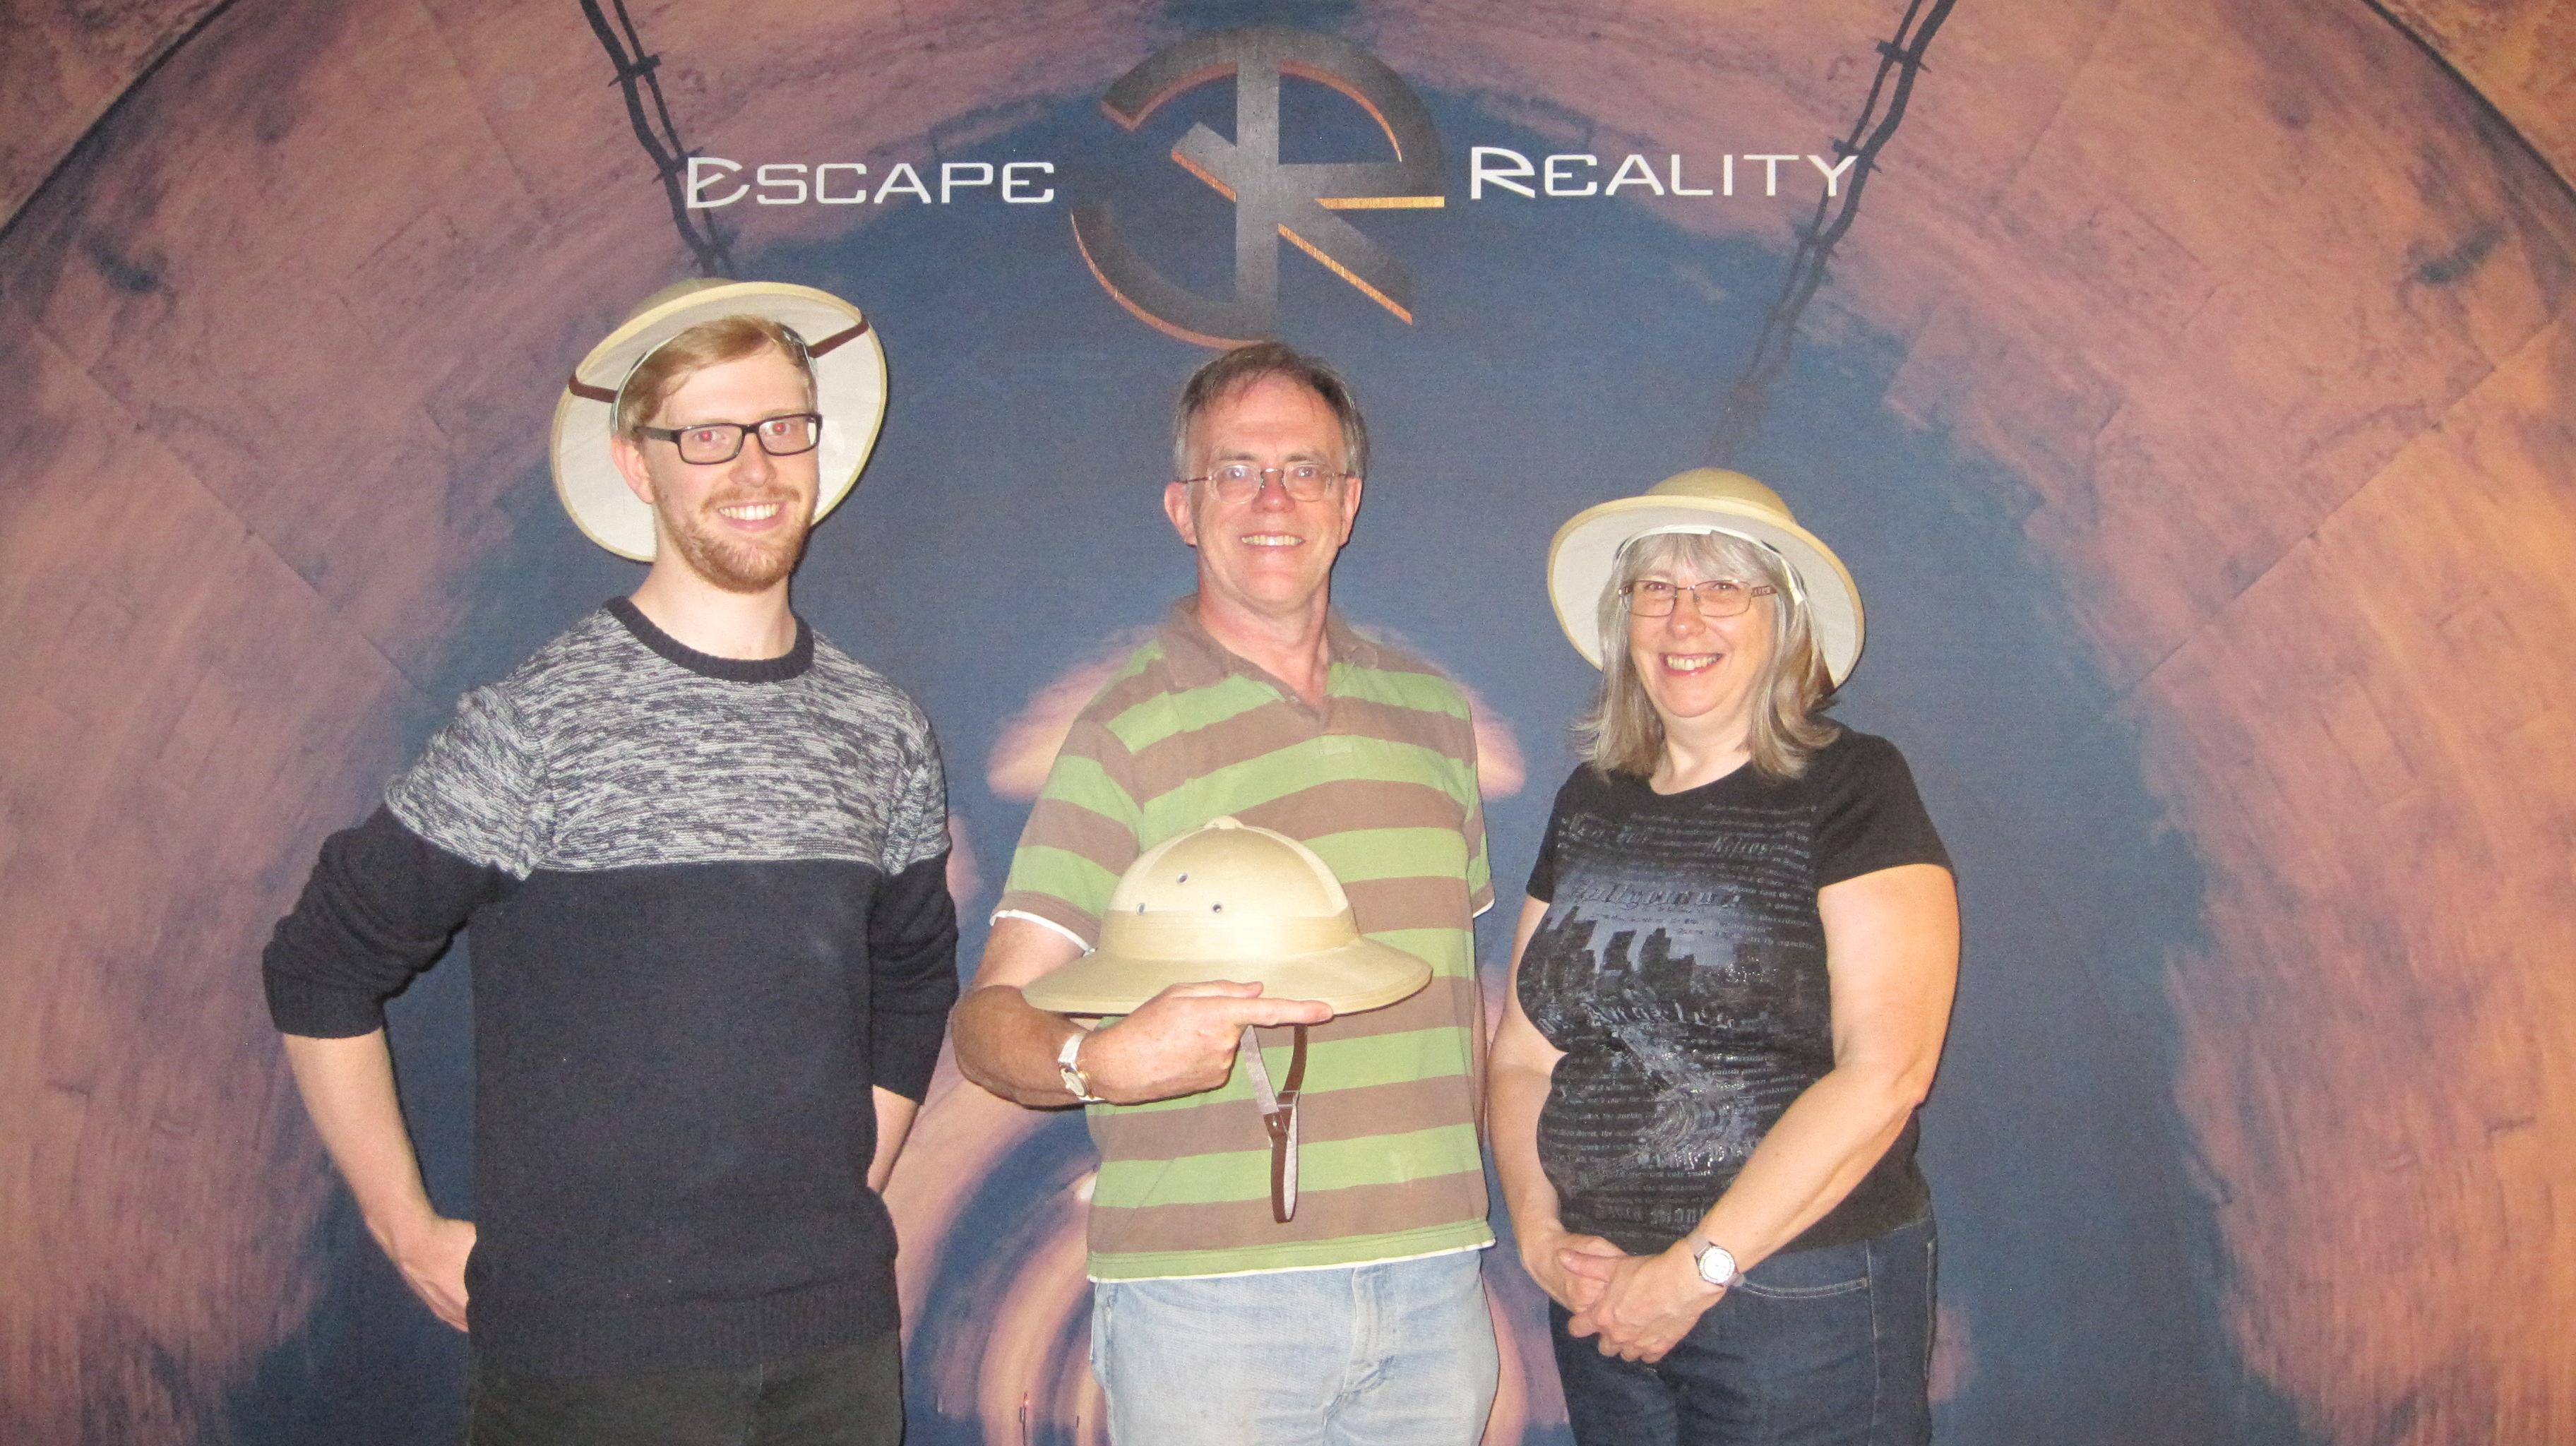 Escape reality at JUNGALA